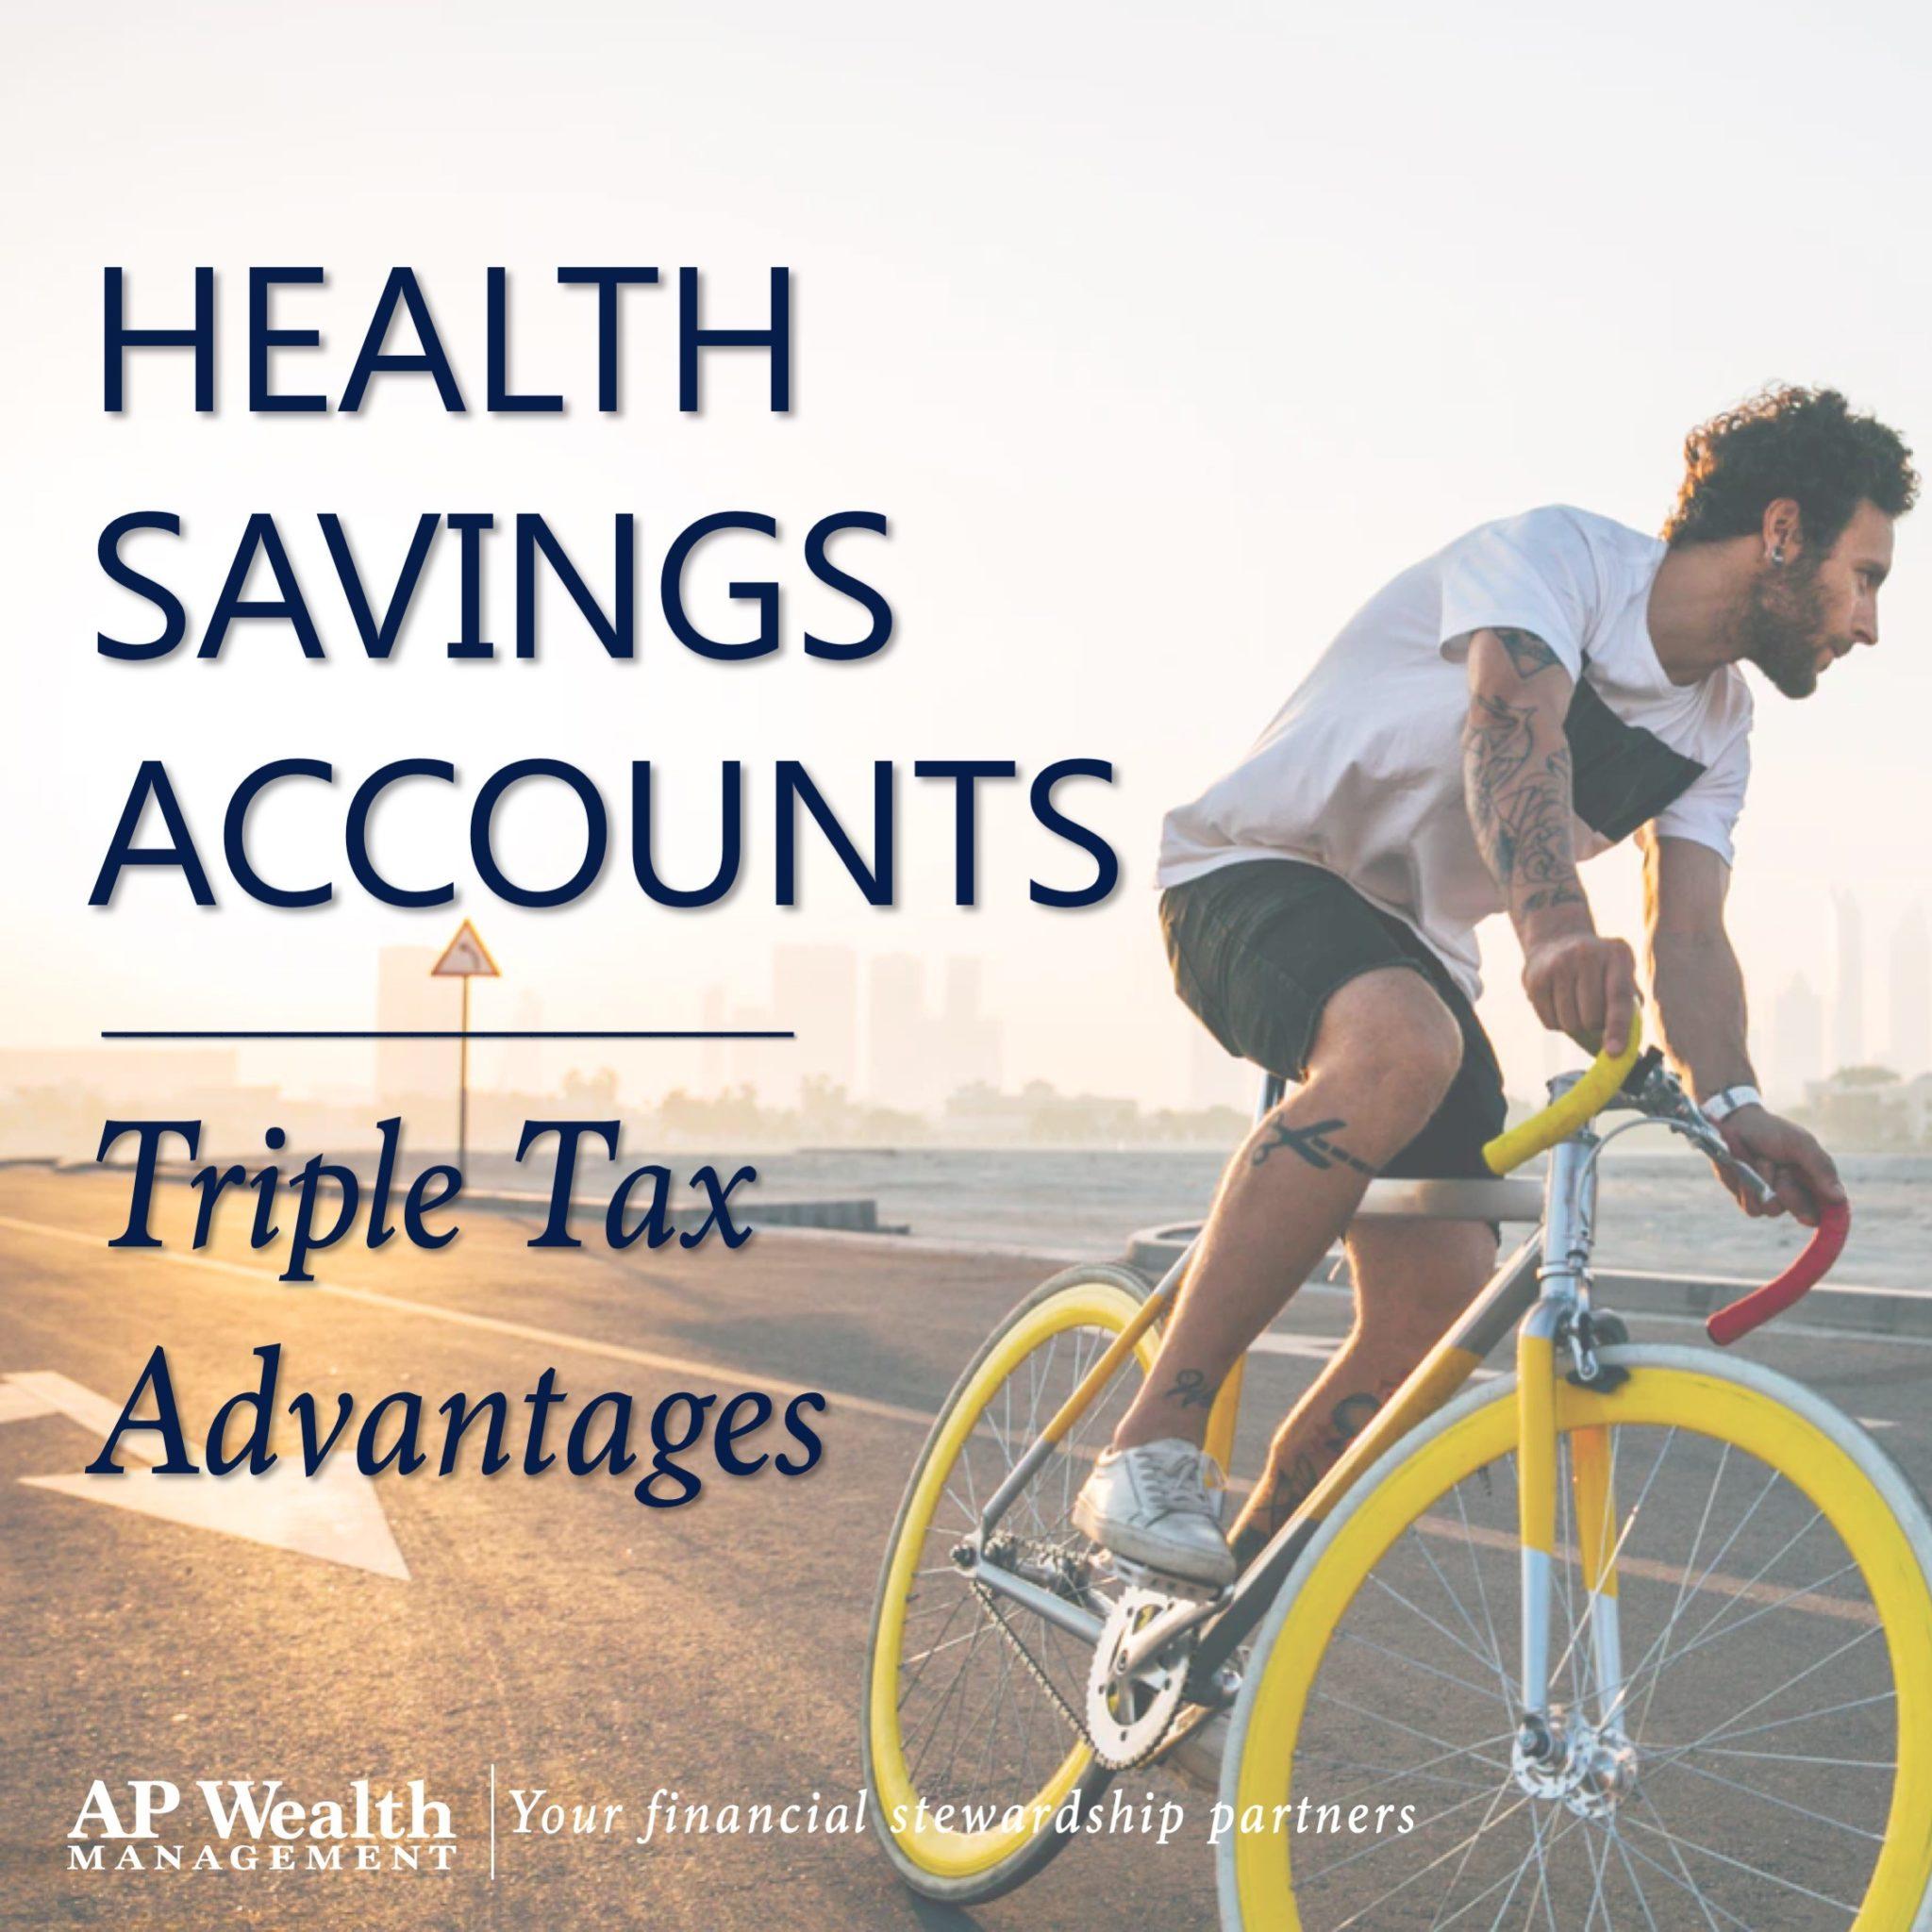 Health Savings Account Triple Tax Advantage